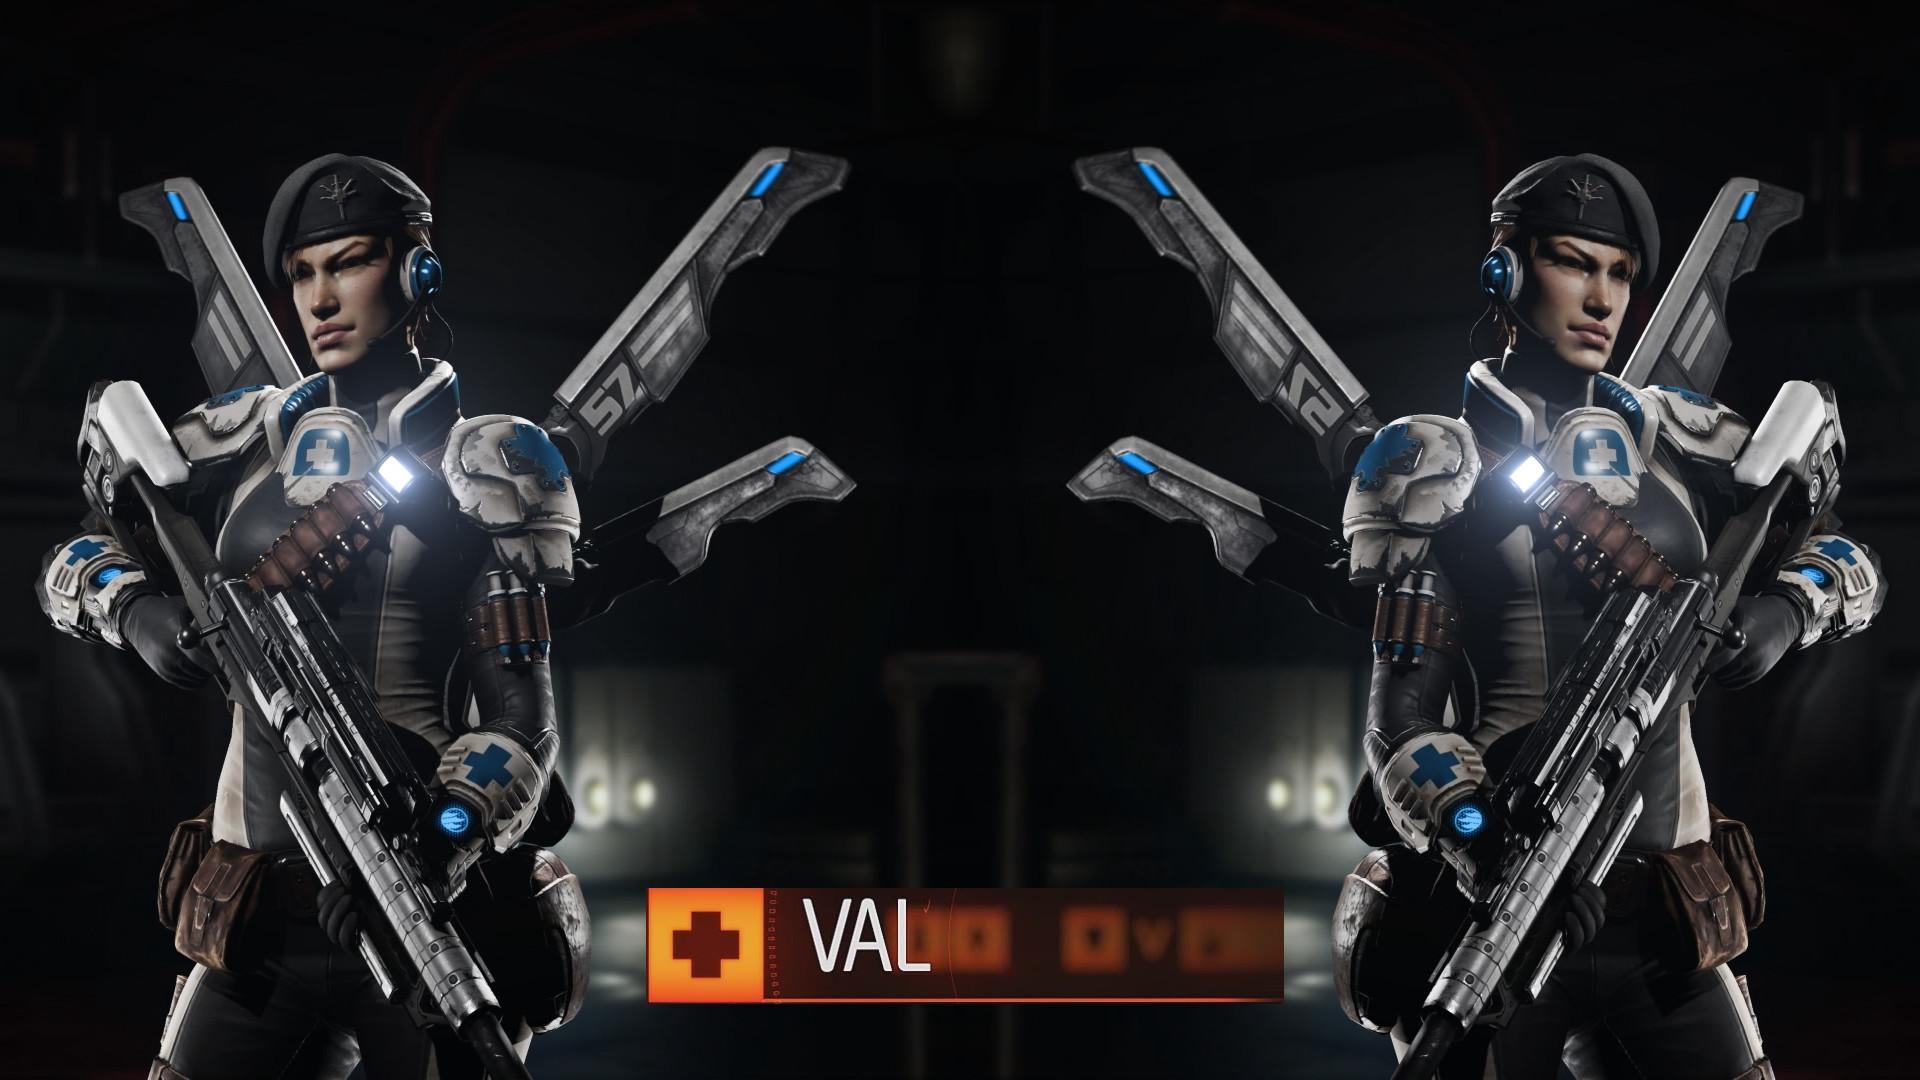 Evolve Val Wallpaper 1080p by IDarkStalker Evolve Val Wallpaper 1080p by  IDarkStalker